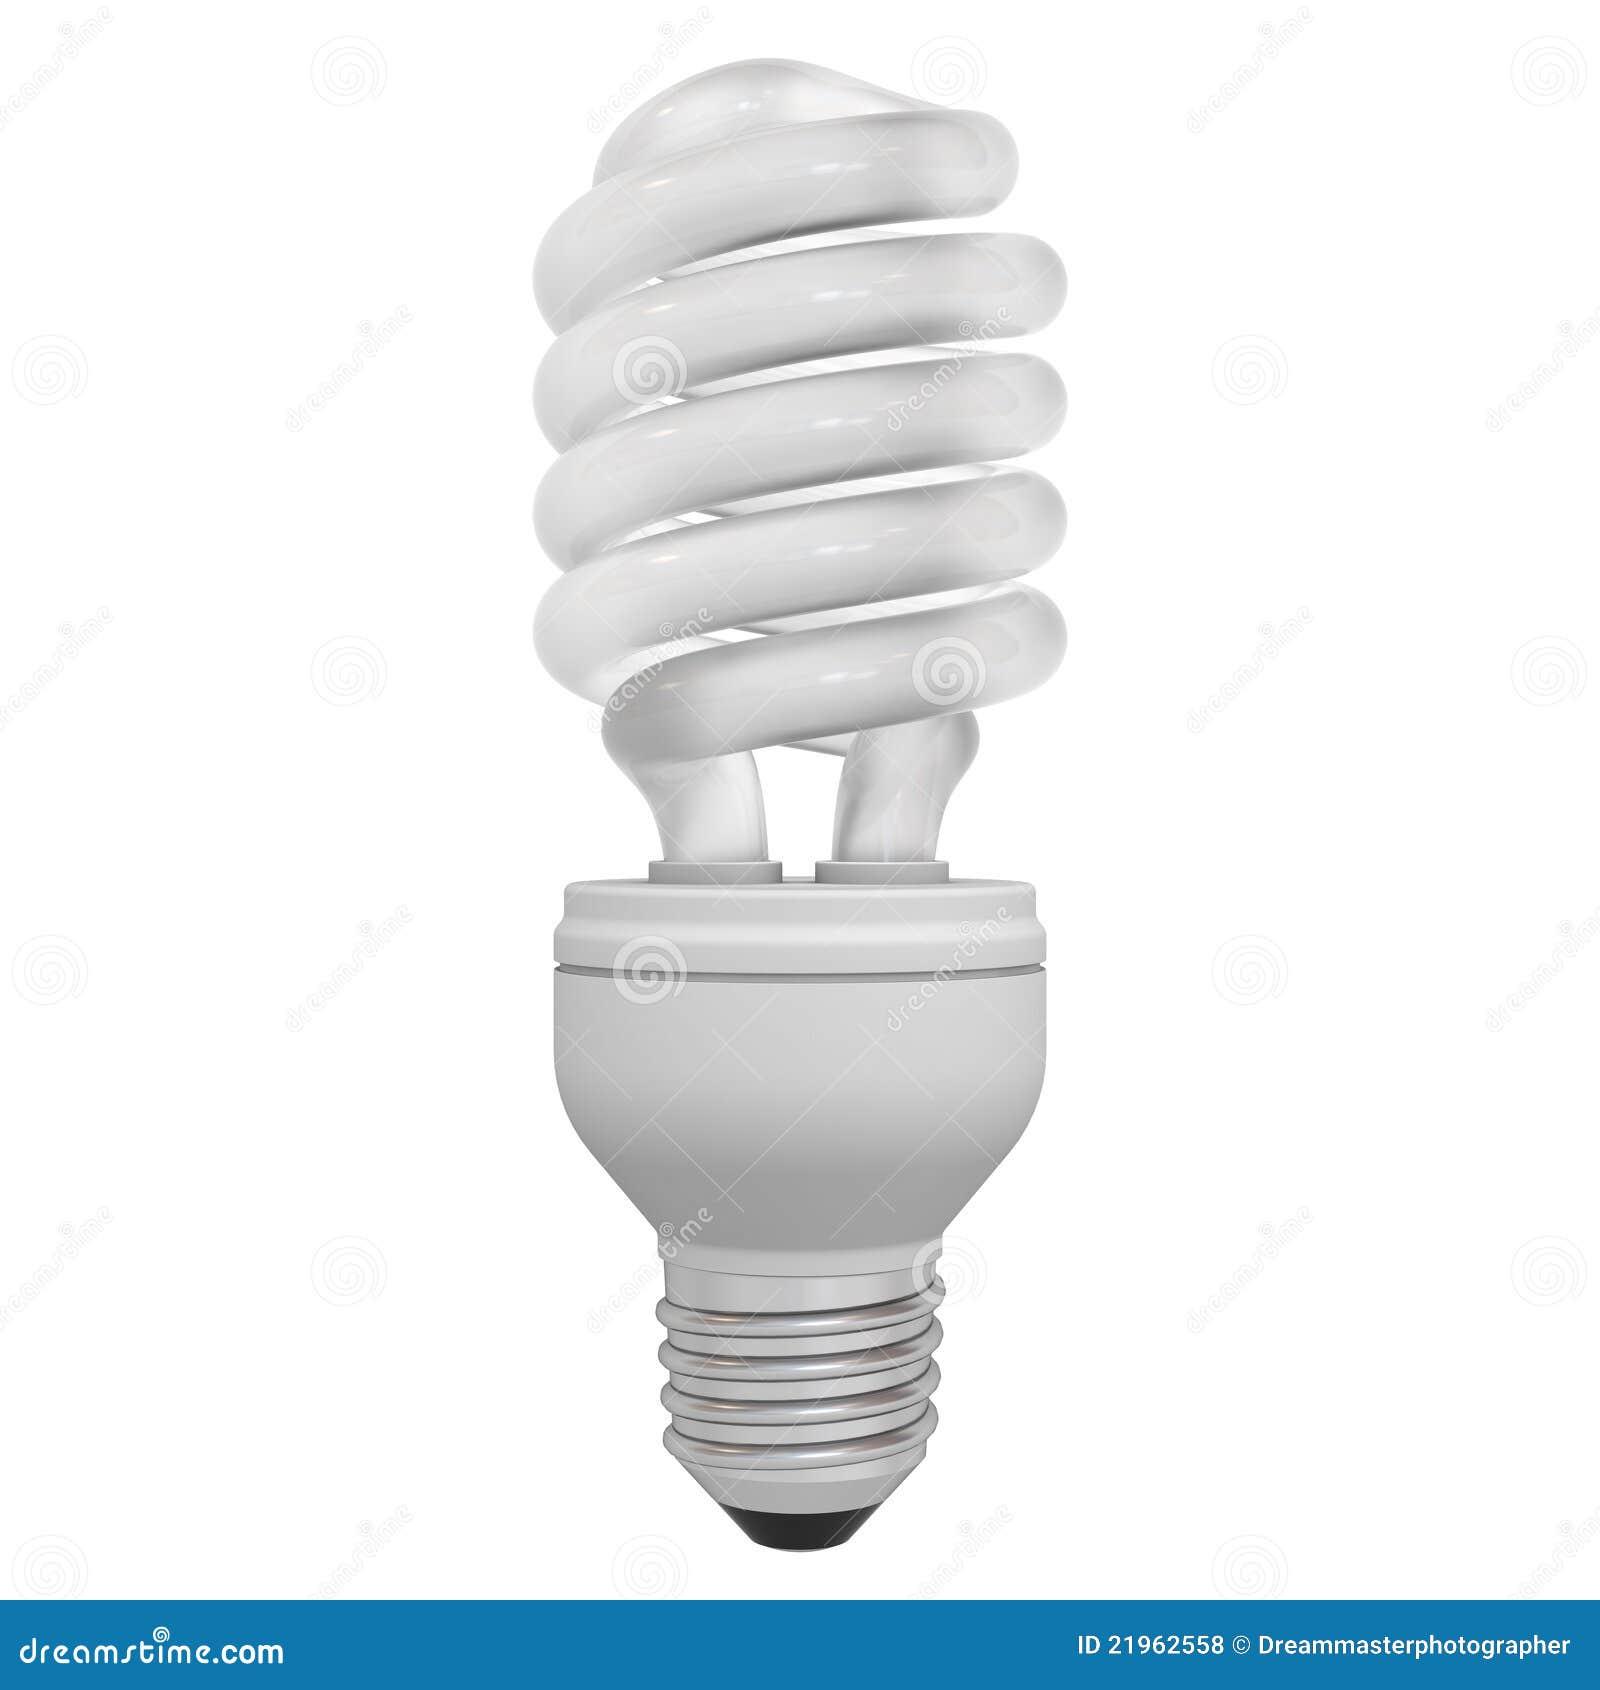 Energy Saving Compact Fluorescent Light Bulb Royalty Free